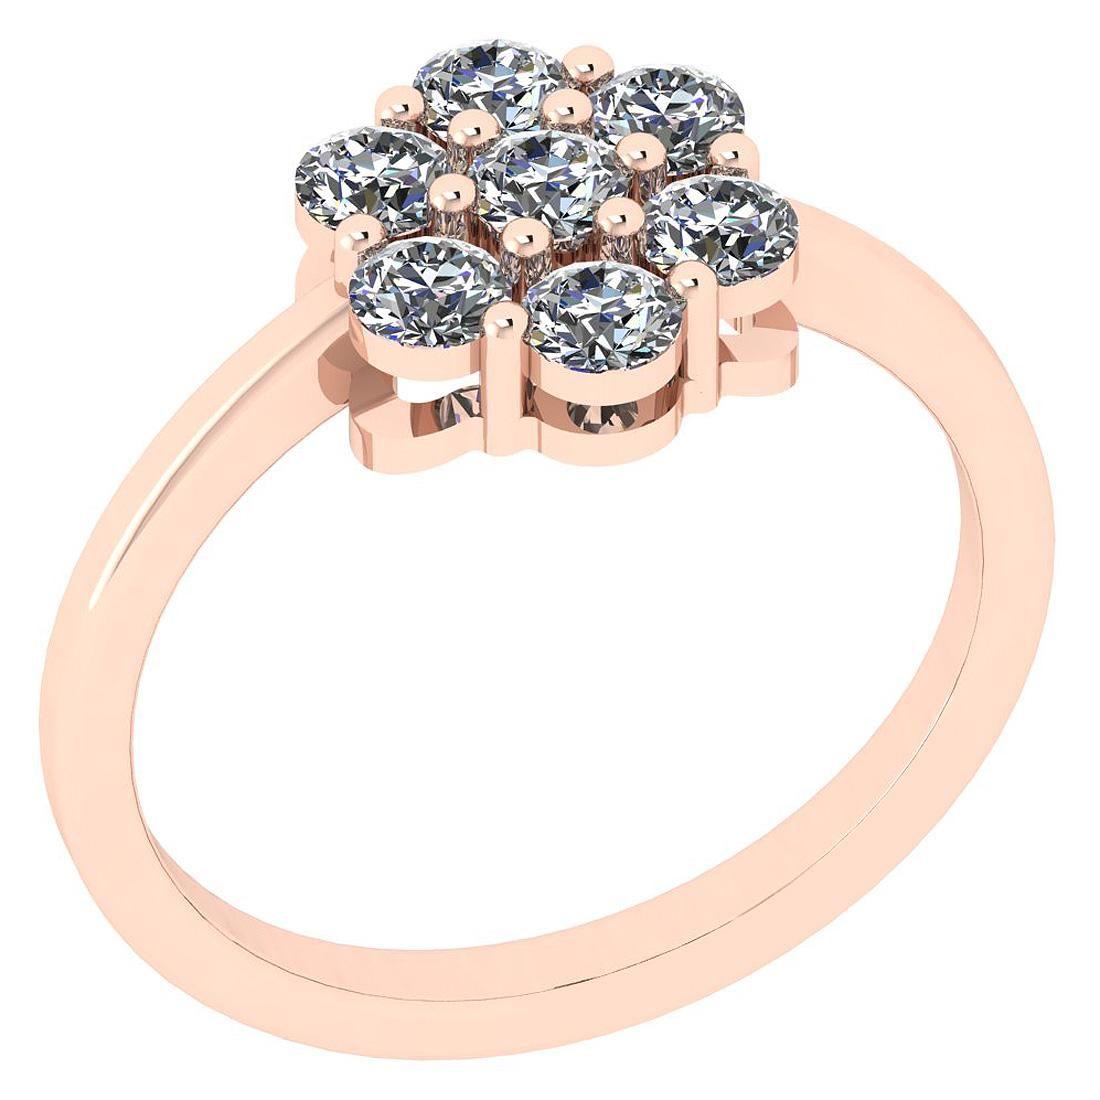 Certified 0.48 Ctw Diamond SI2/I1 14K Rose Gold Ring